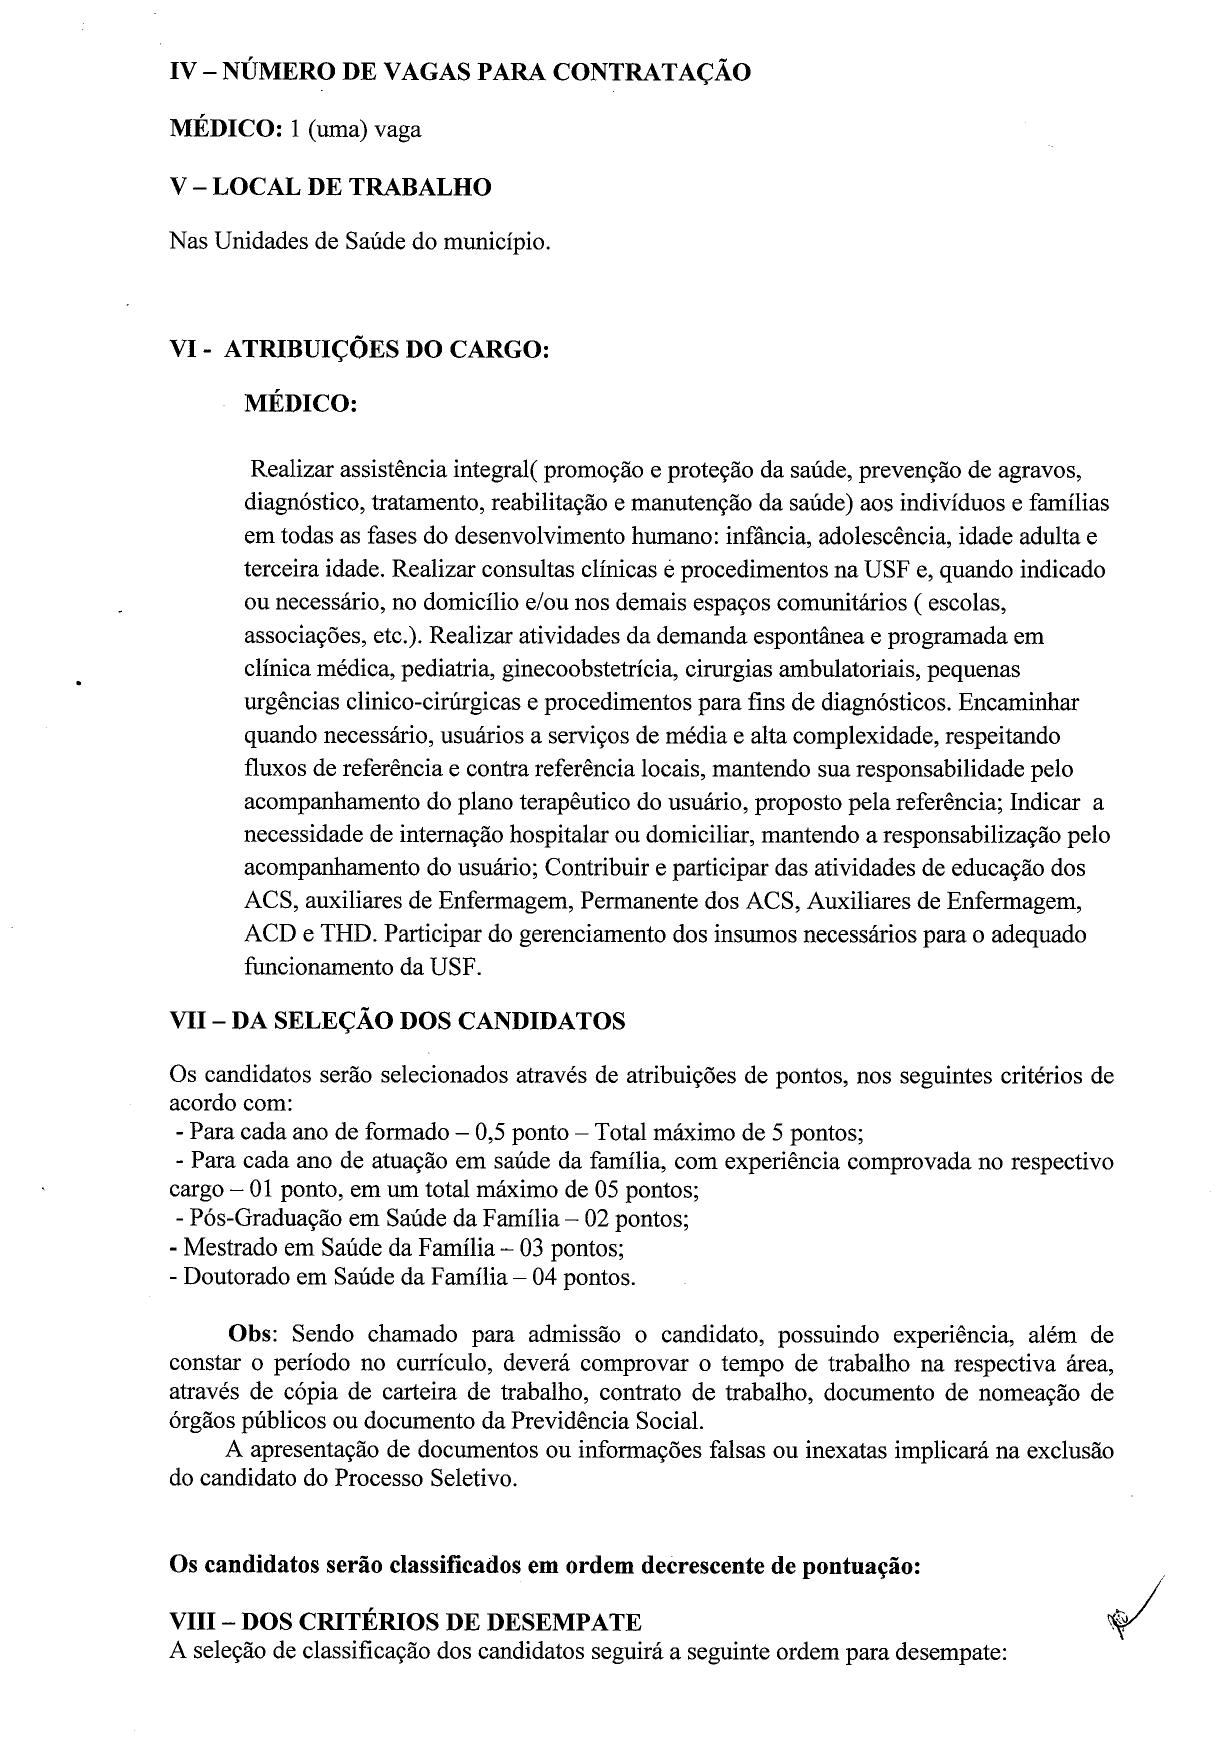 edital (2)_page-0001